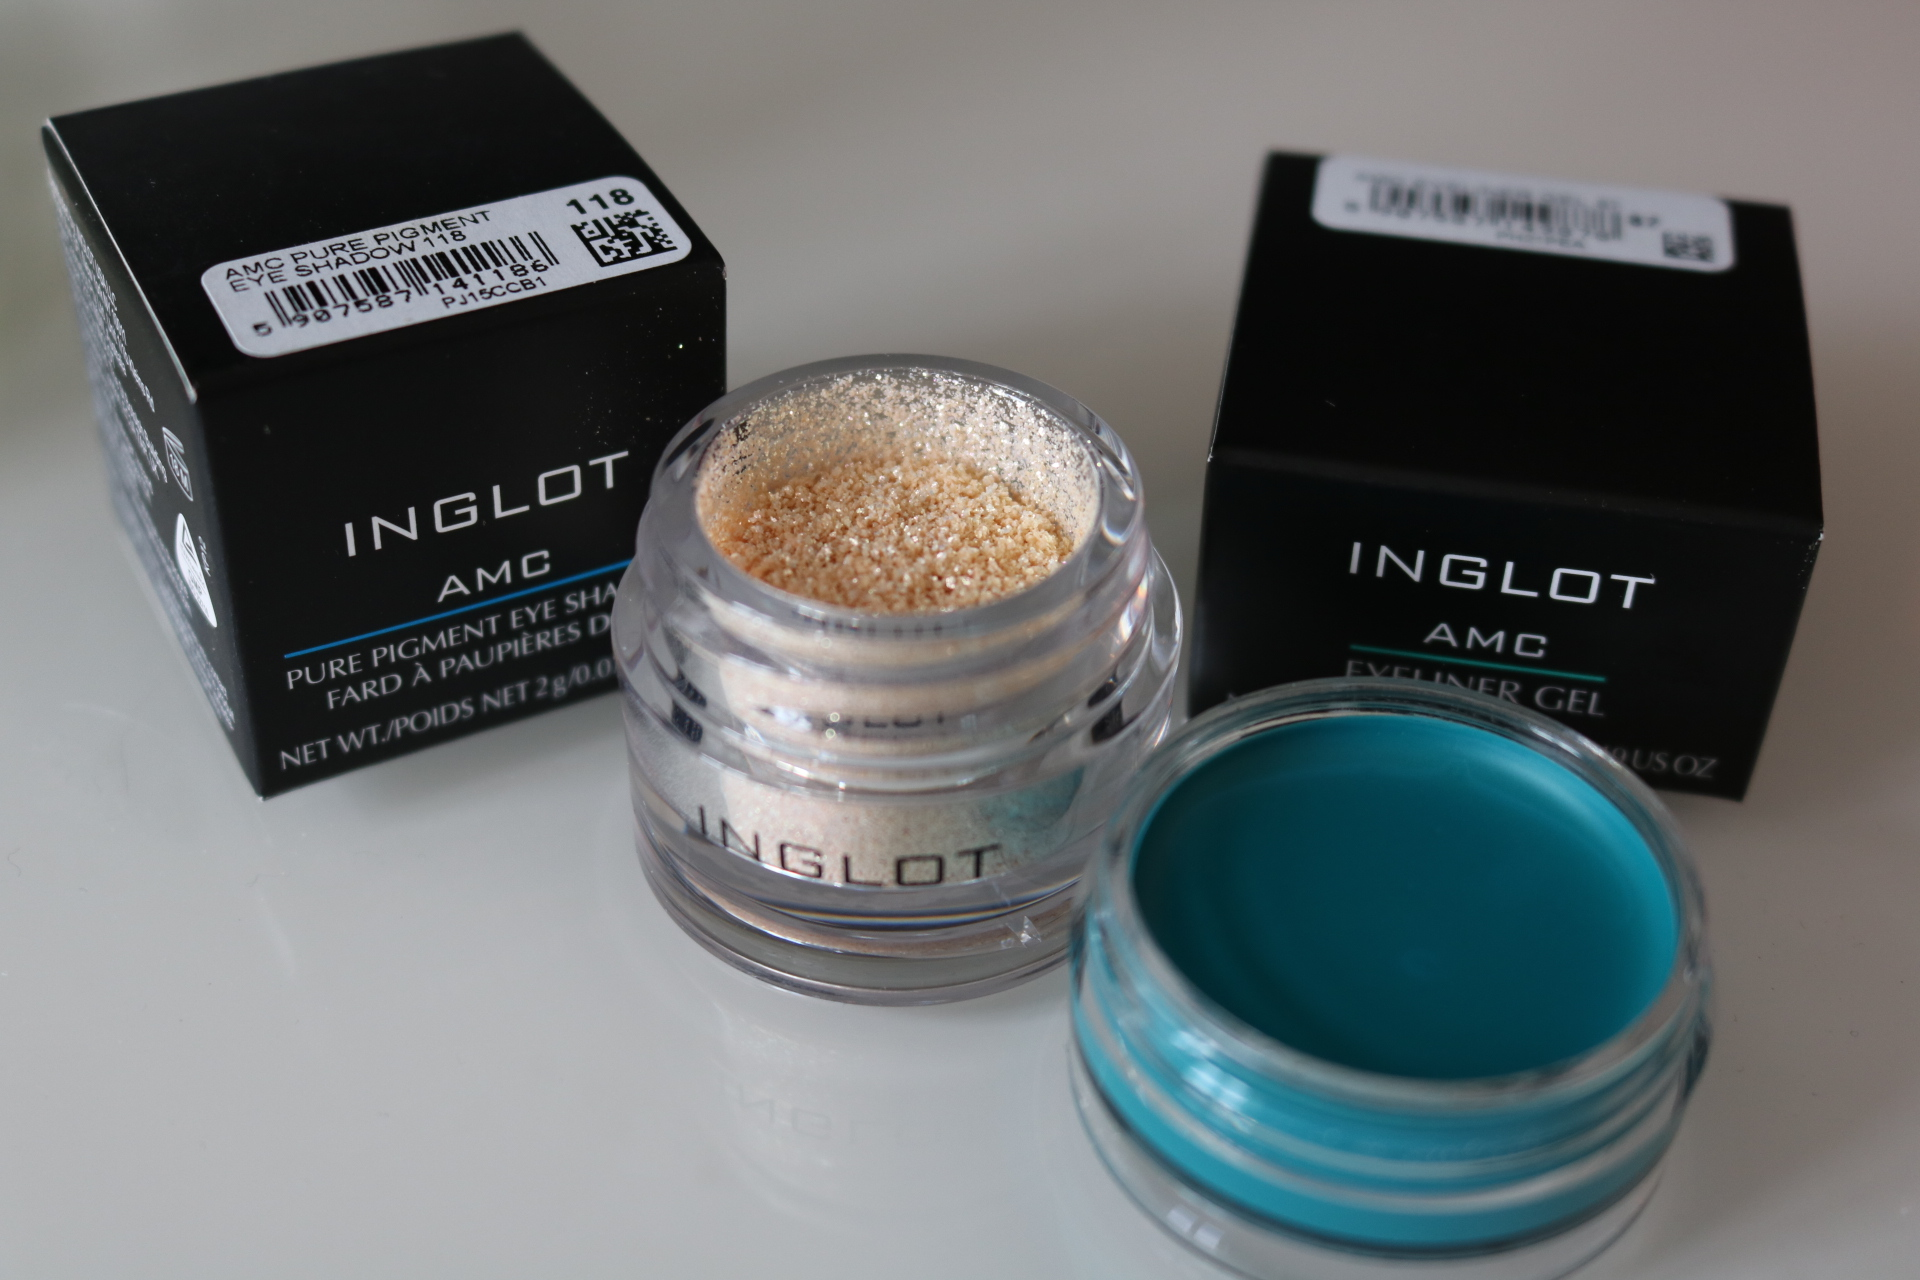 Inglot vattenfast AMC eyeliner nummer 87 test skönhetsblogg amandahans